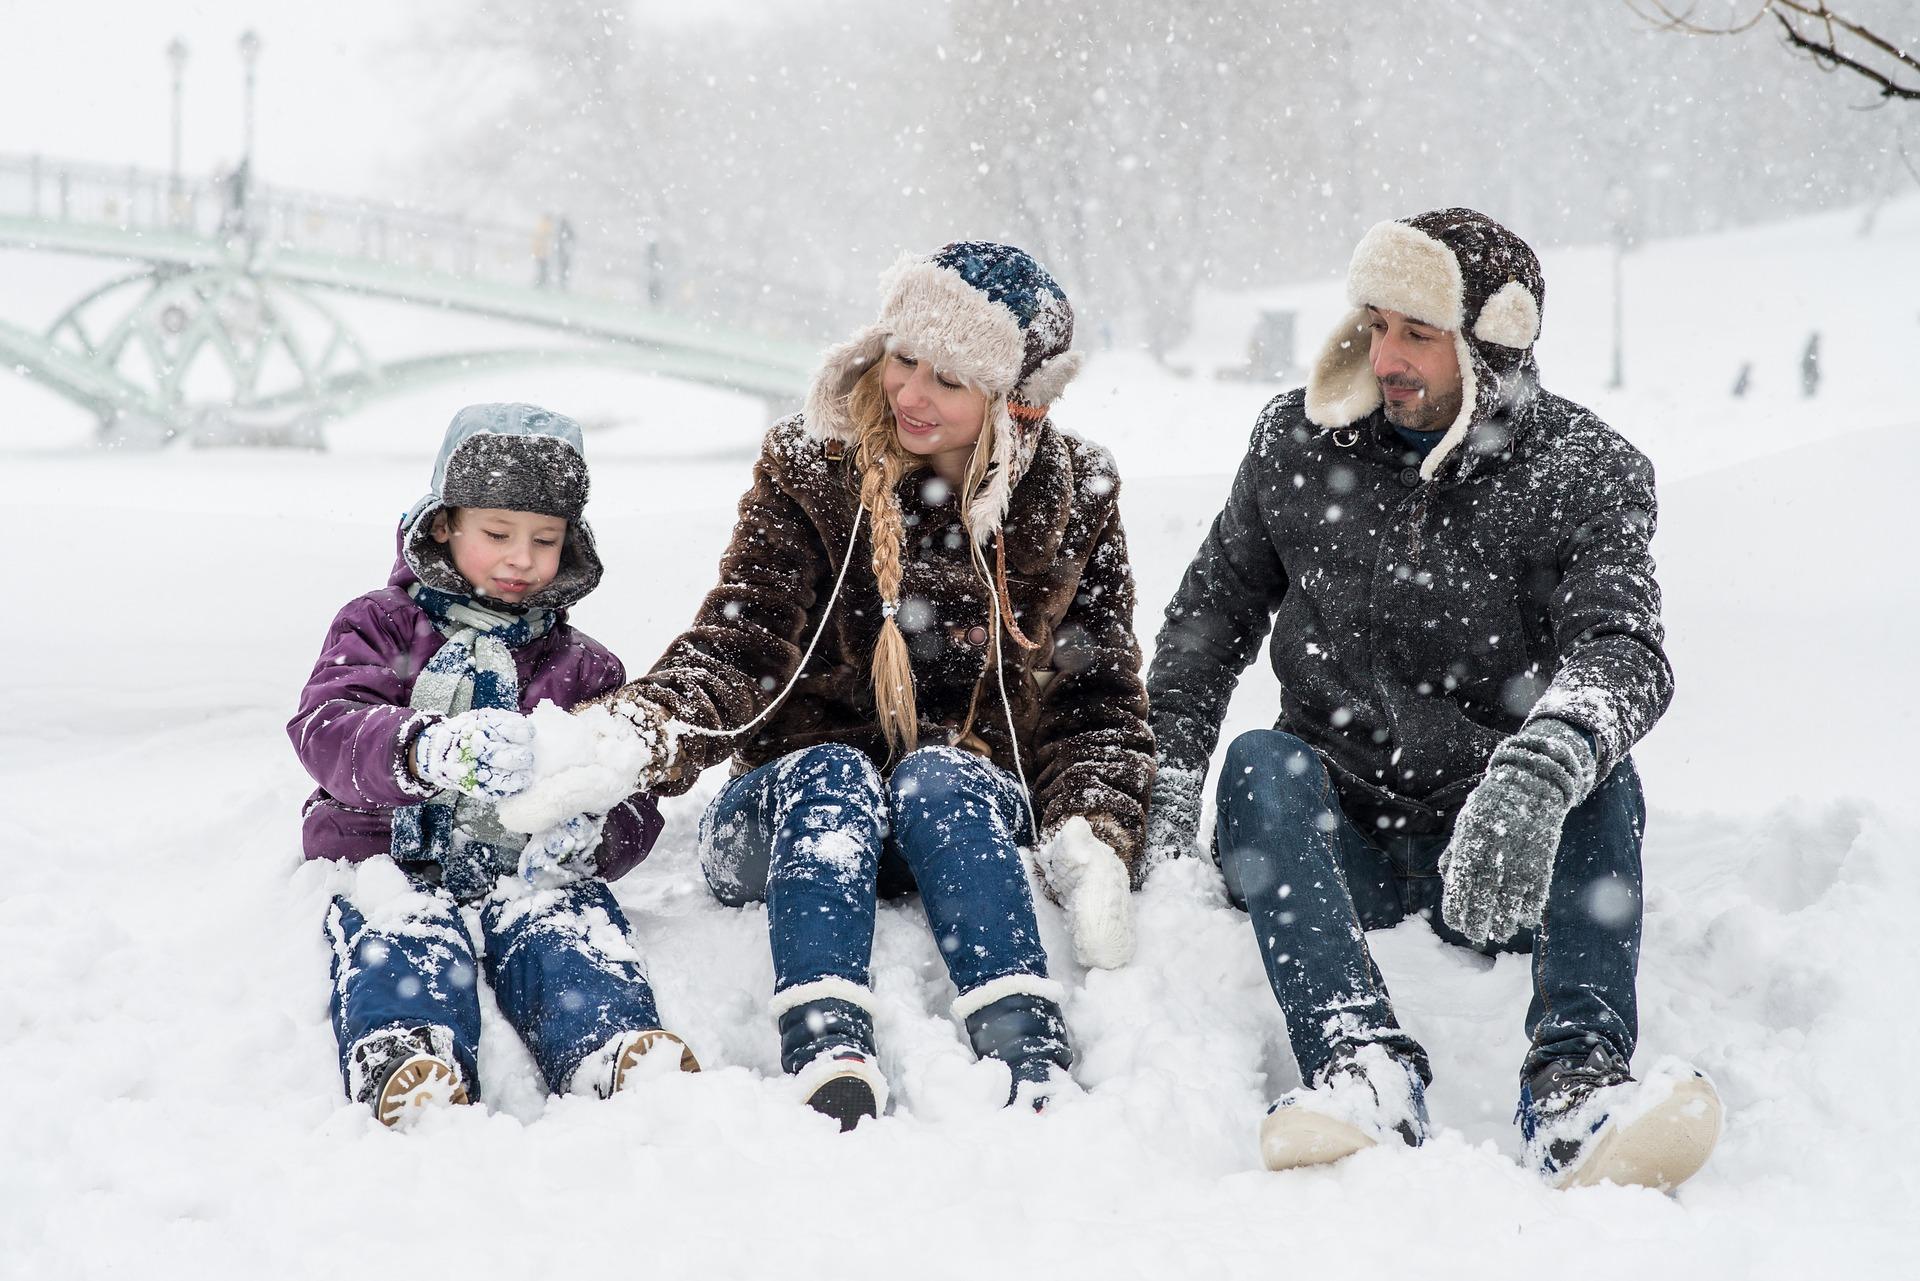 Lapsi ja vanhemmat istuvat lumihangessa